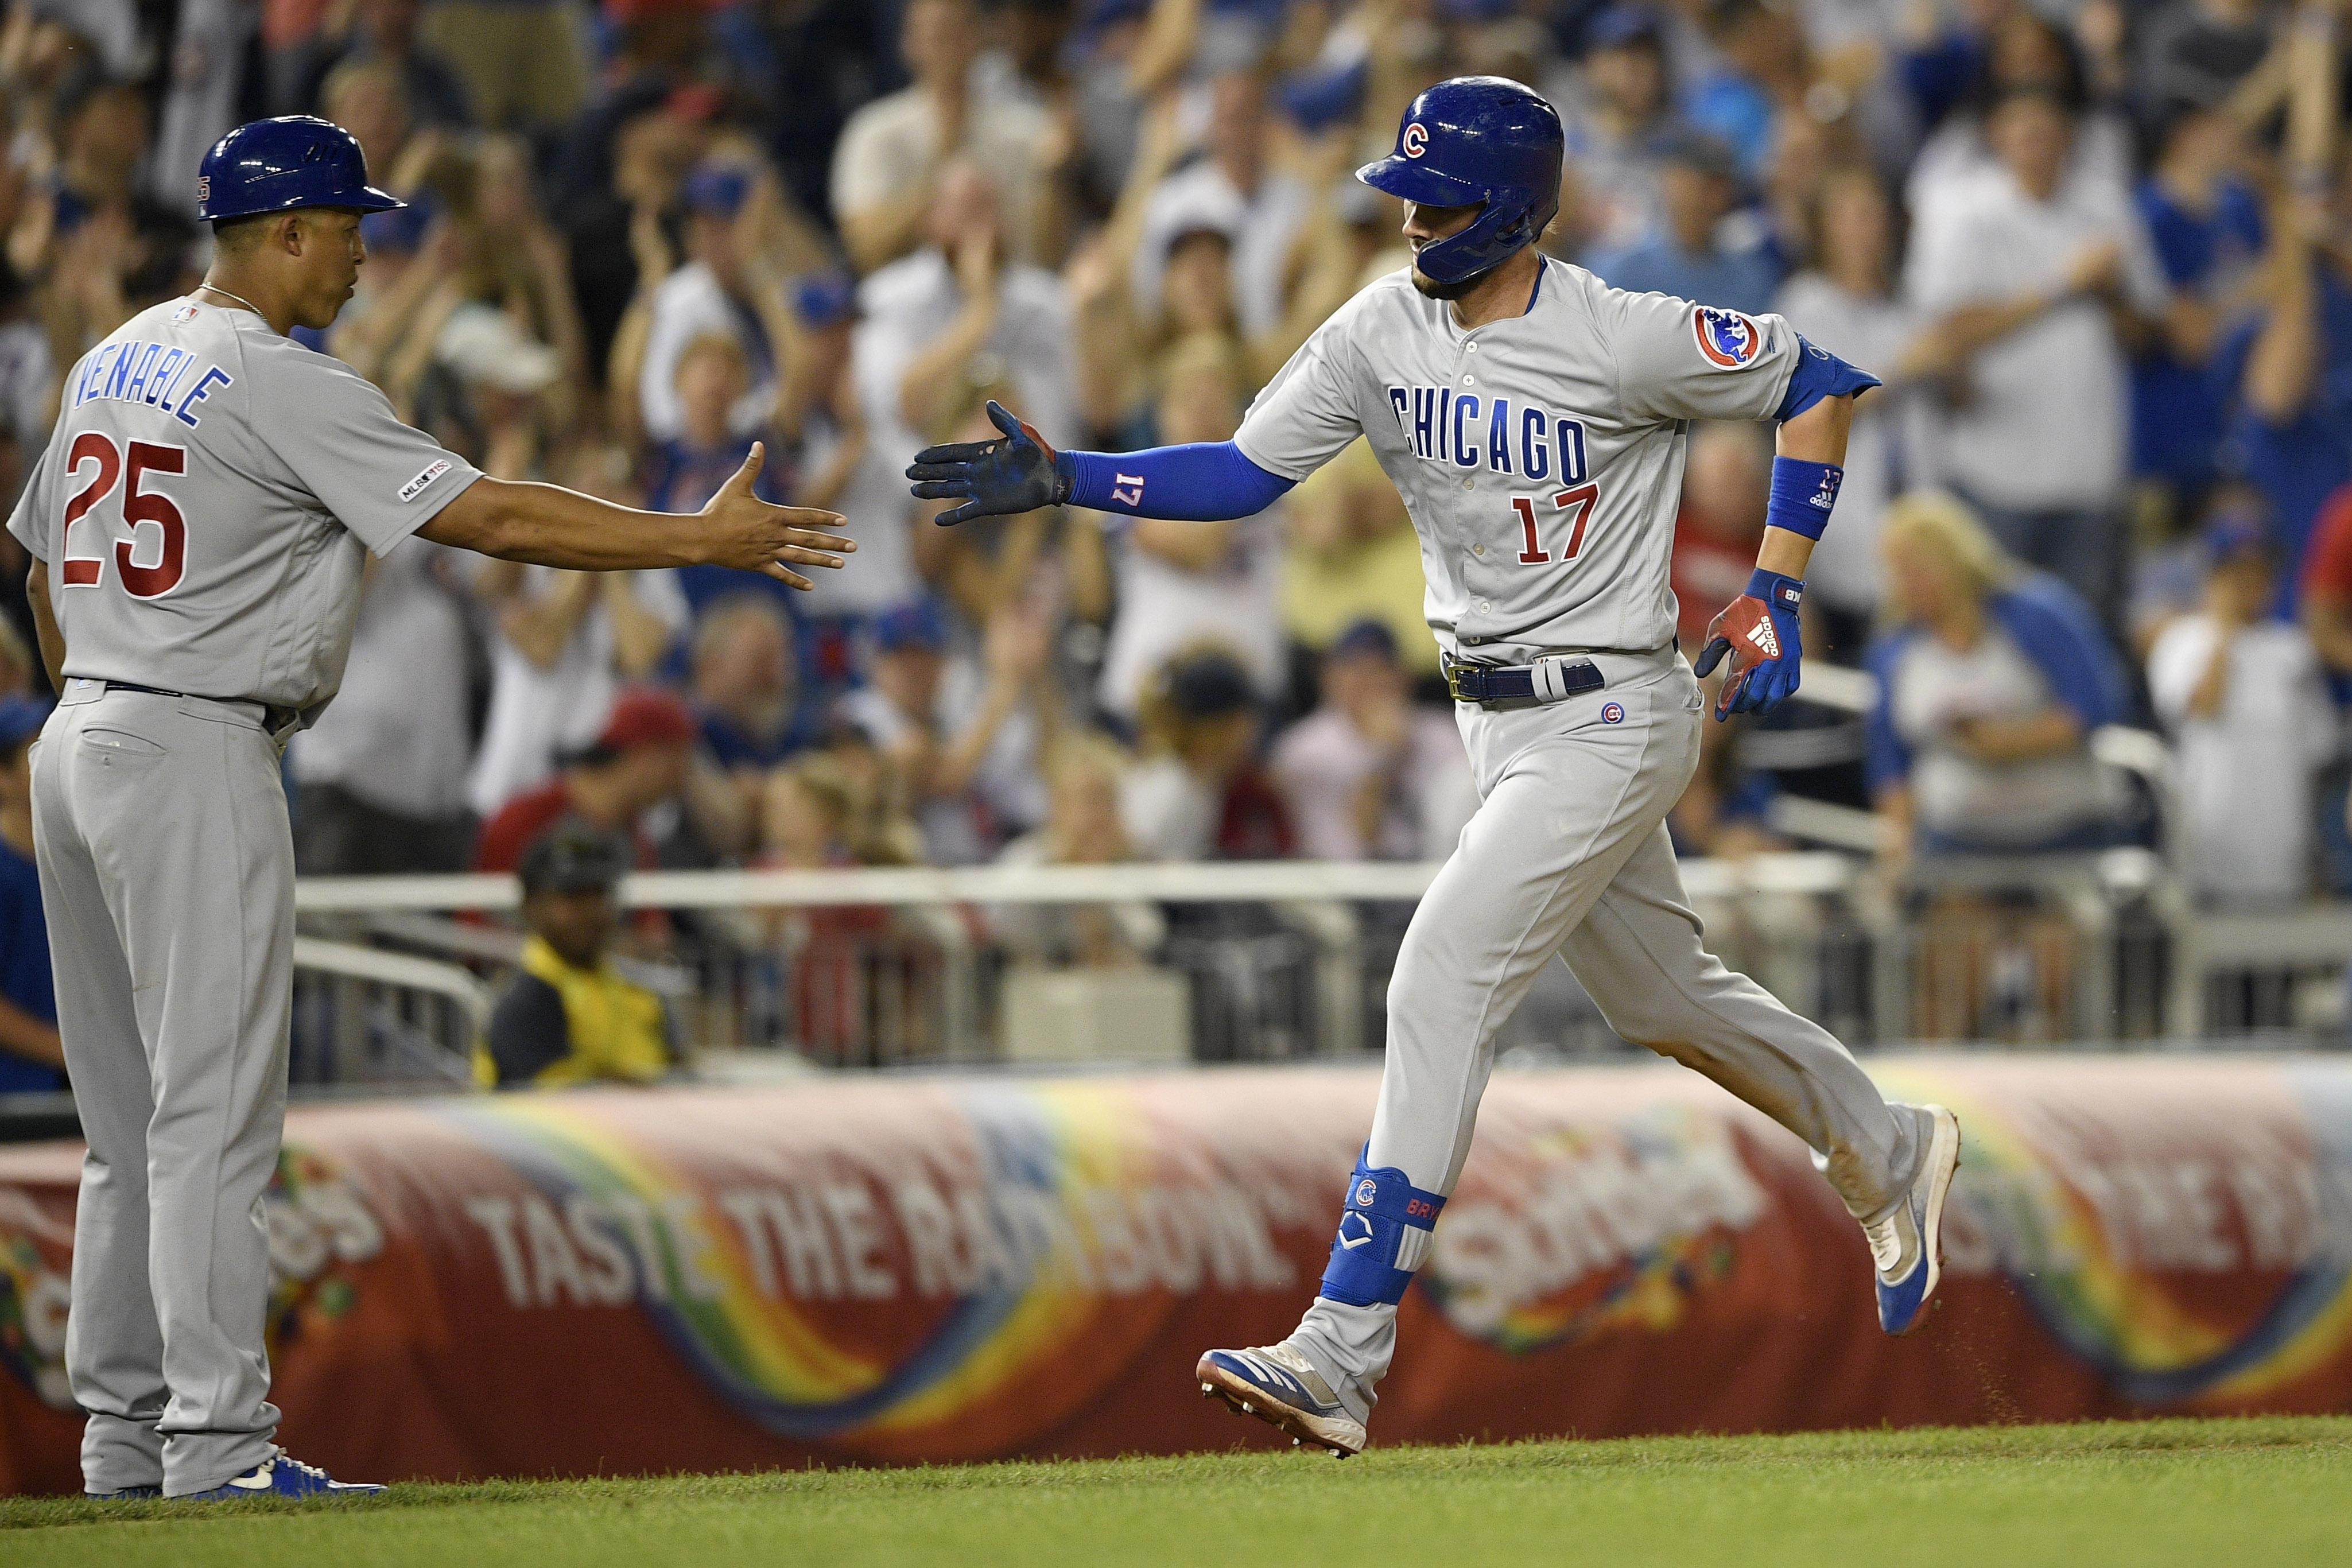 Kris Bryant hits 3 HRs, Cubs punish Nats' bullpen for